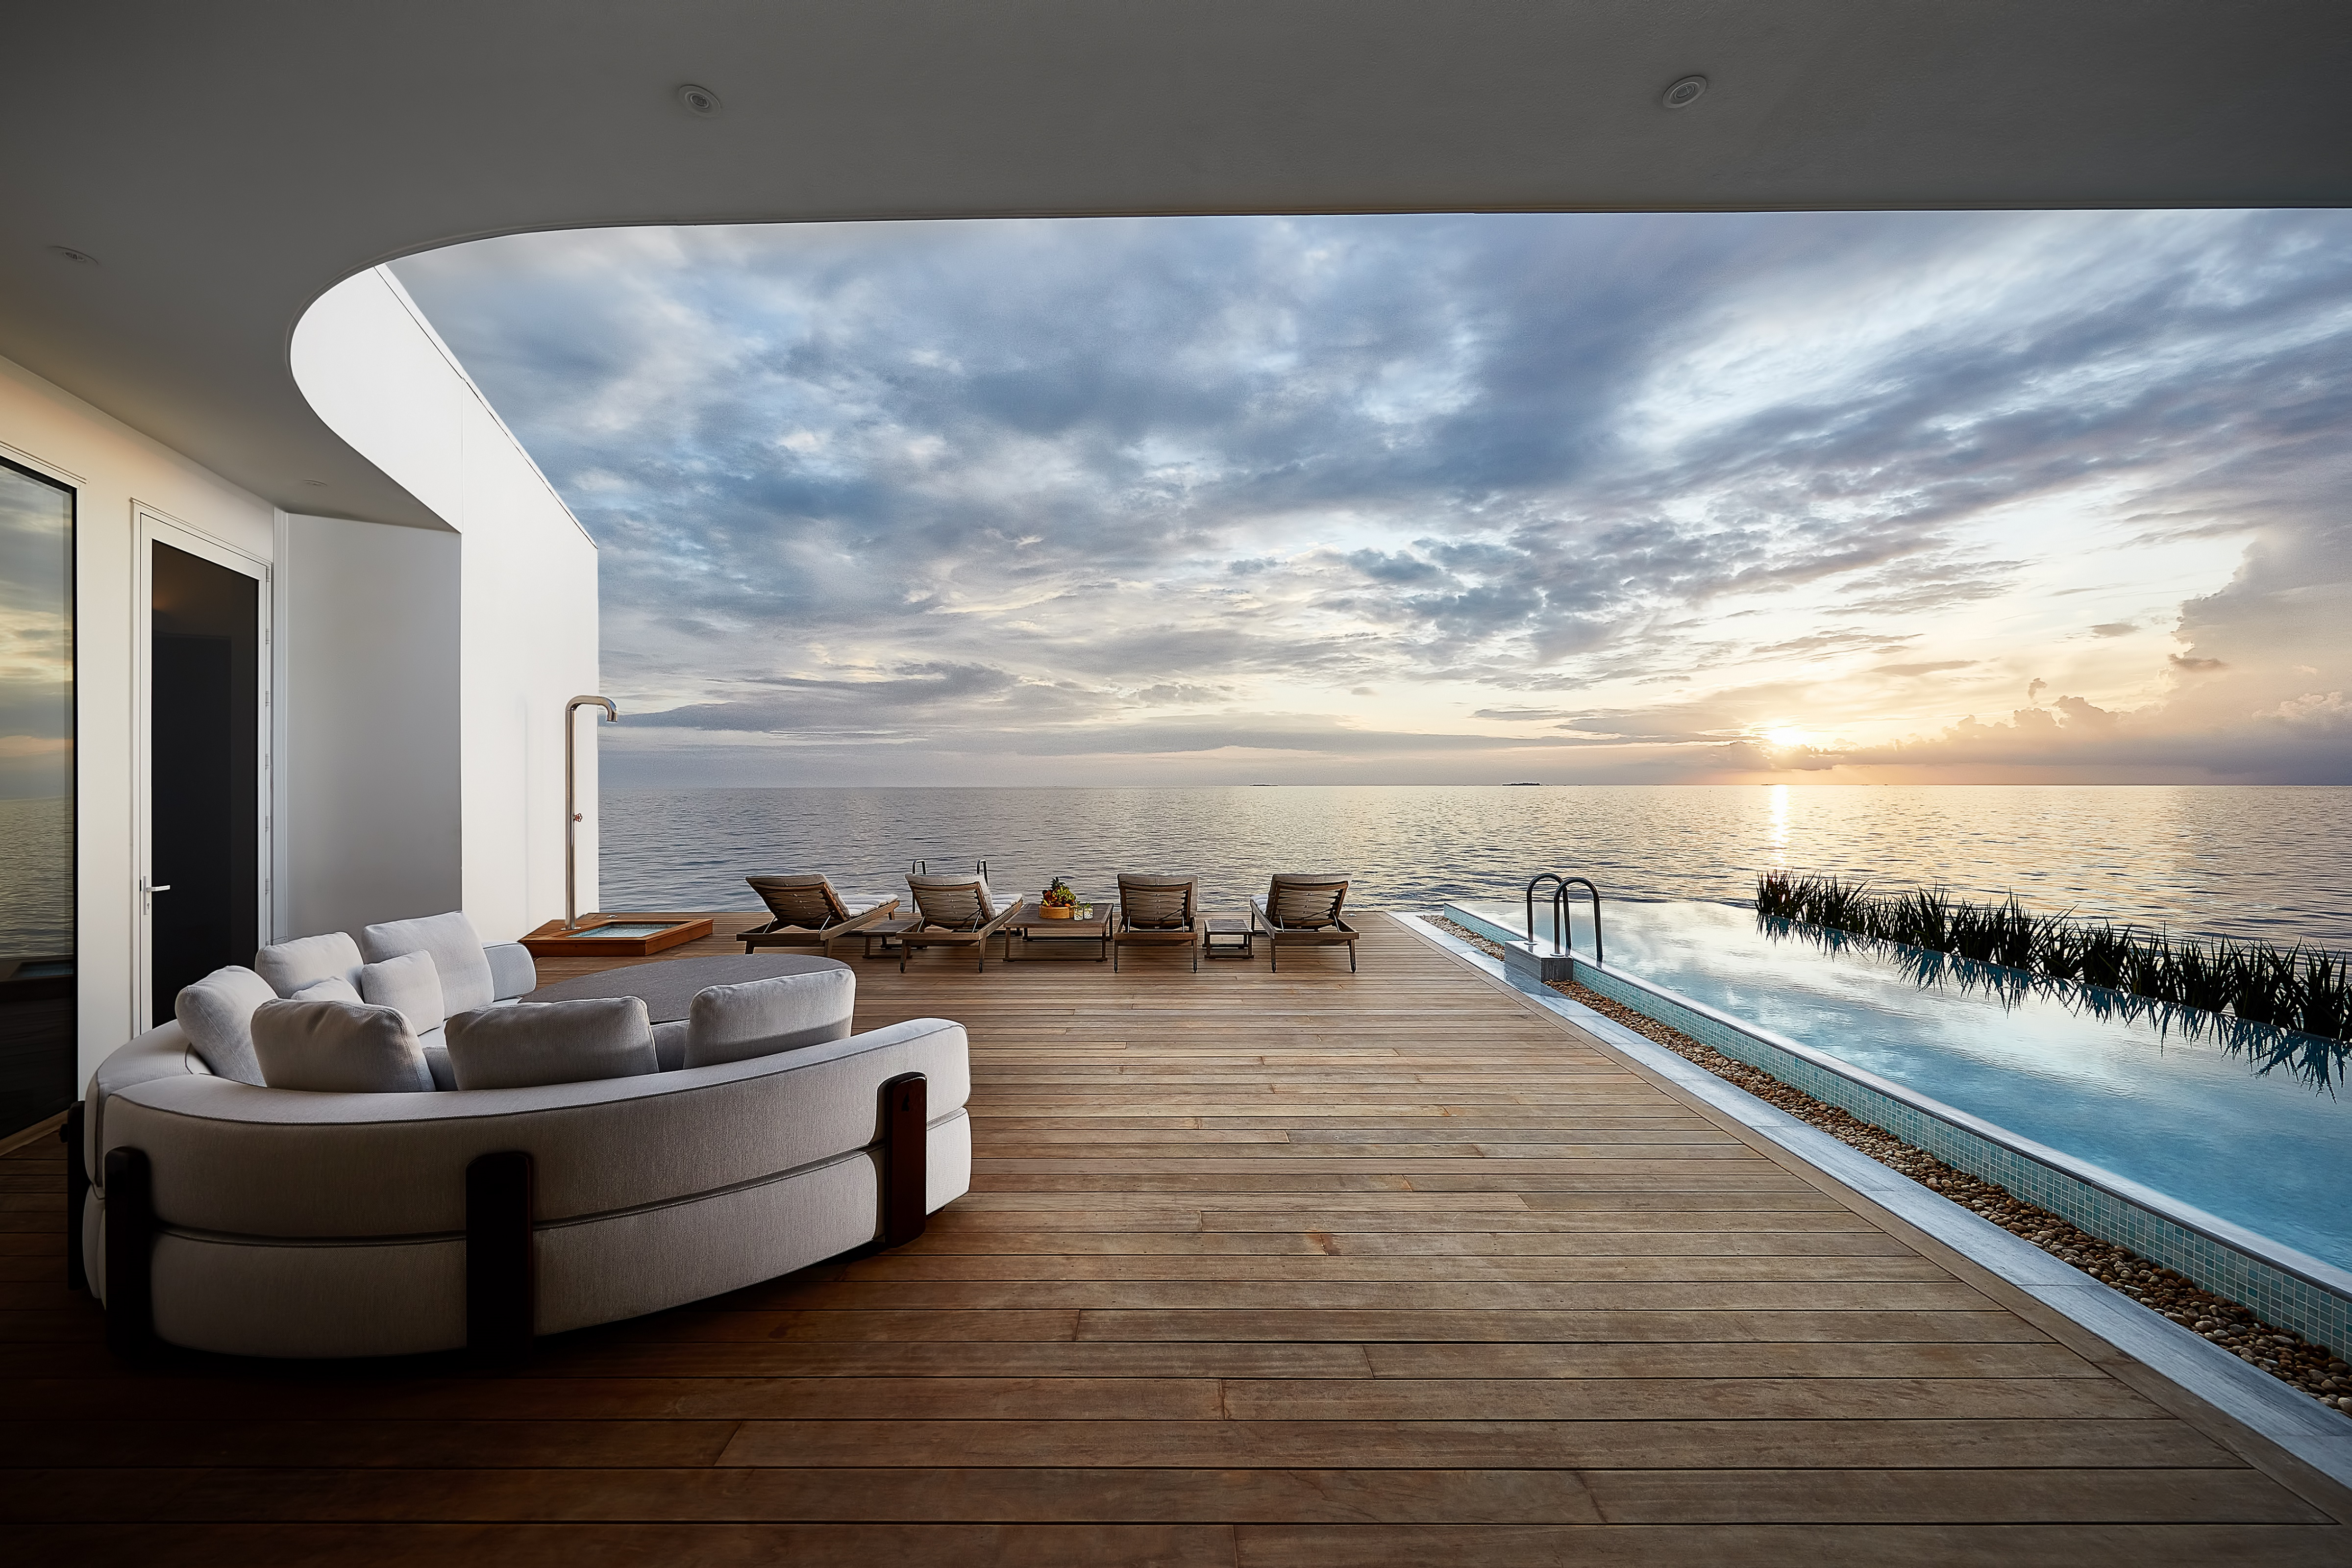 THE MURAKA_HERO_Overwater Deck View Lounge_Architecture_Credt Justin Nicholas